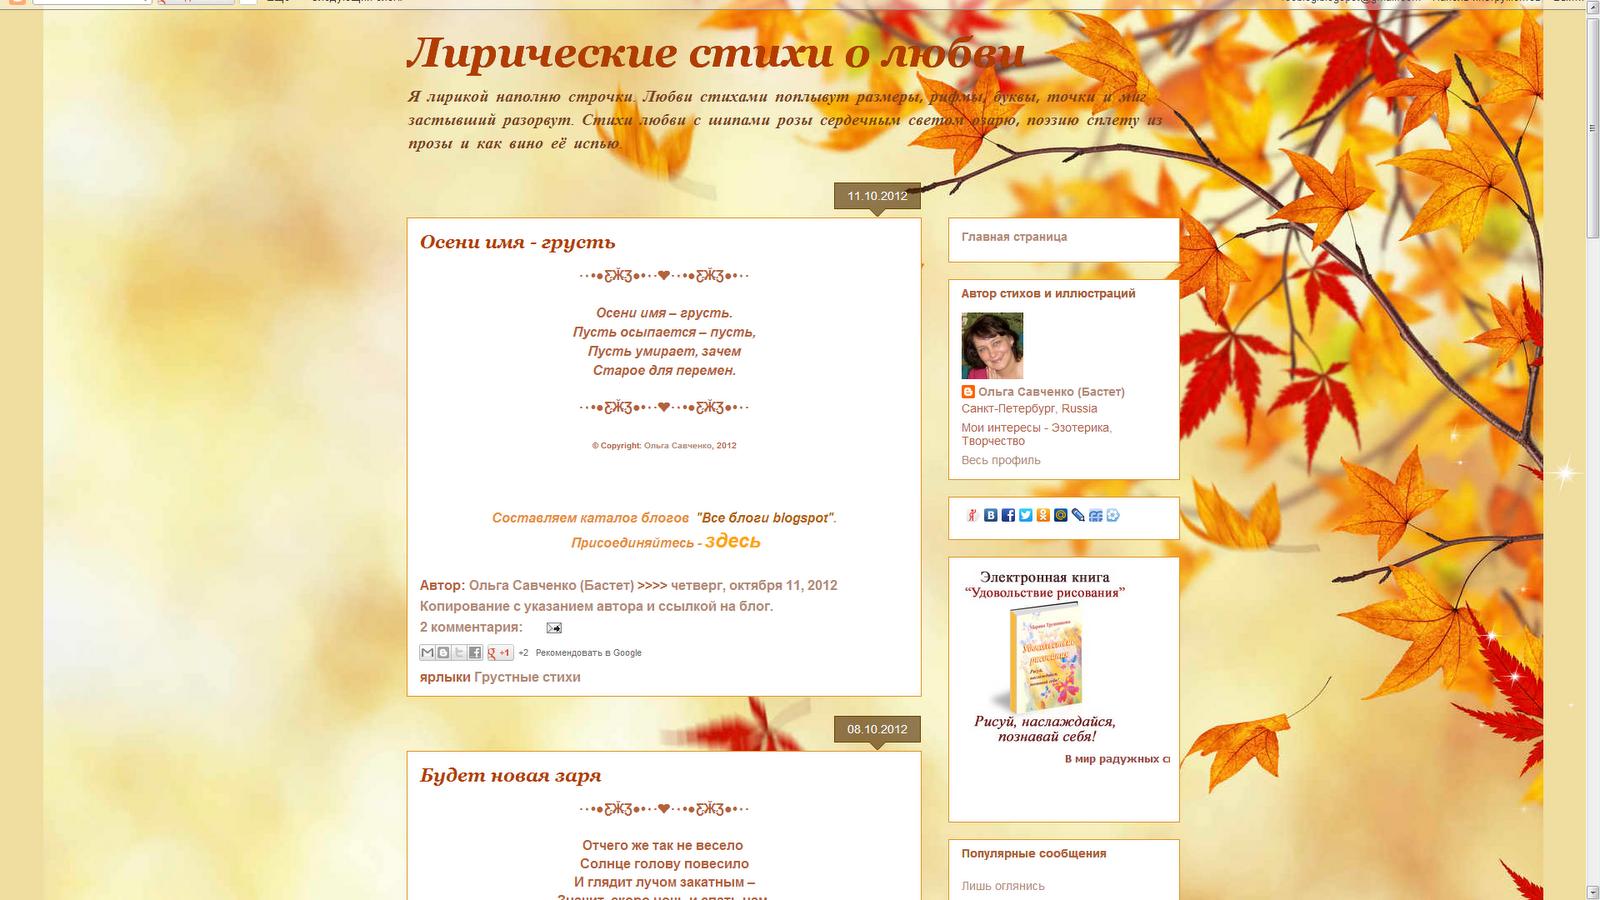 картинки со стихами про любовь -  Картинки и стихи о любви ВКонтакте